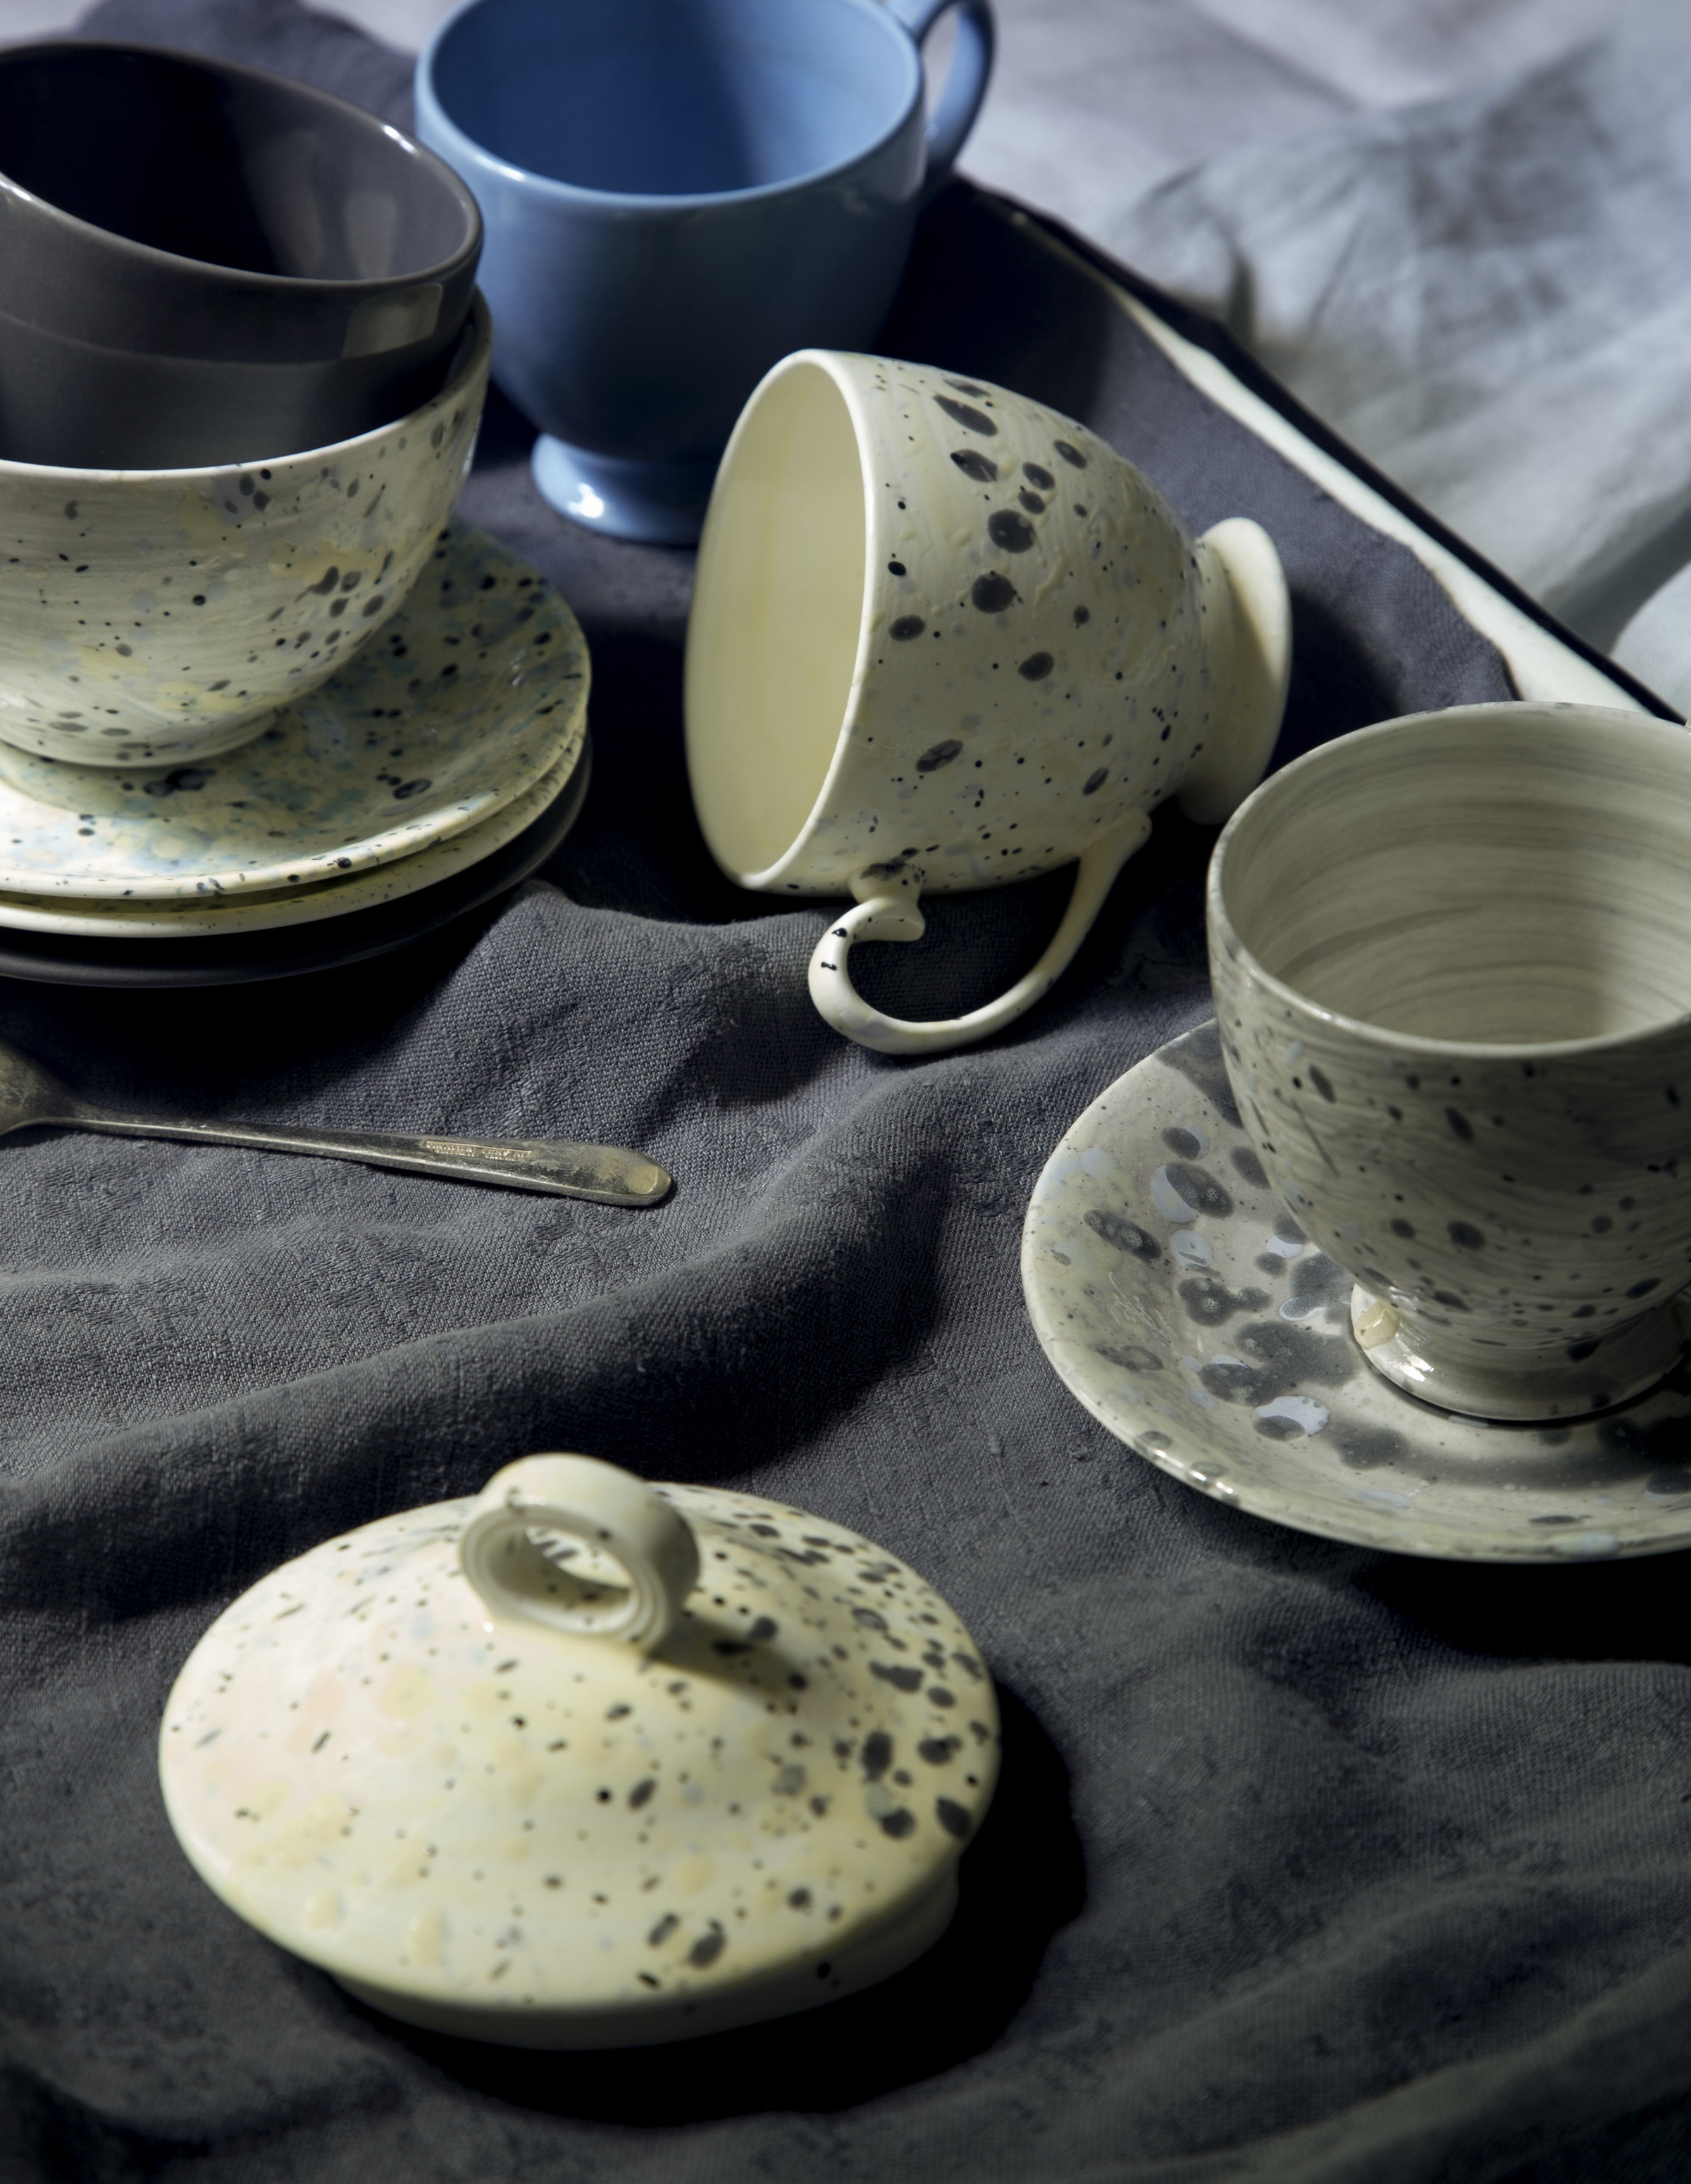 The glaze splattered teacups.